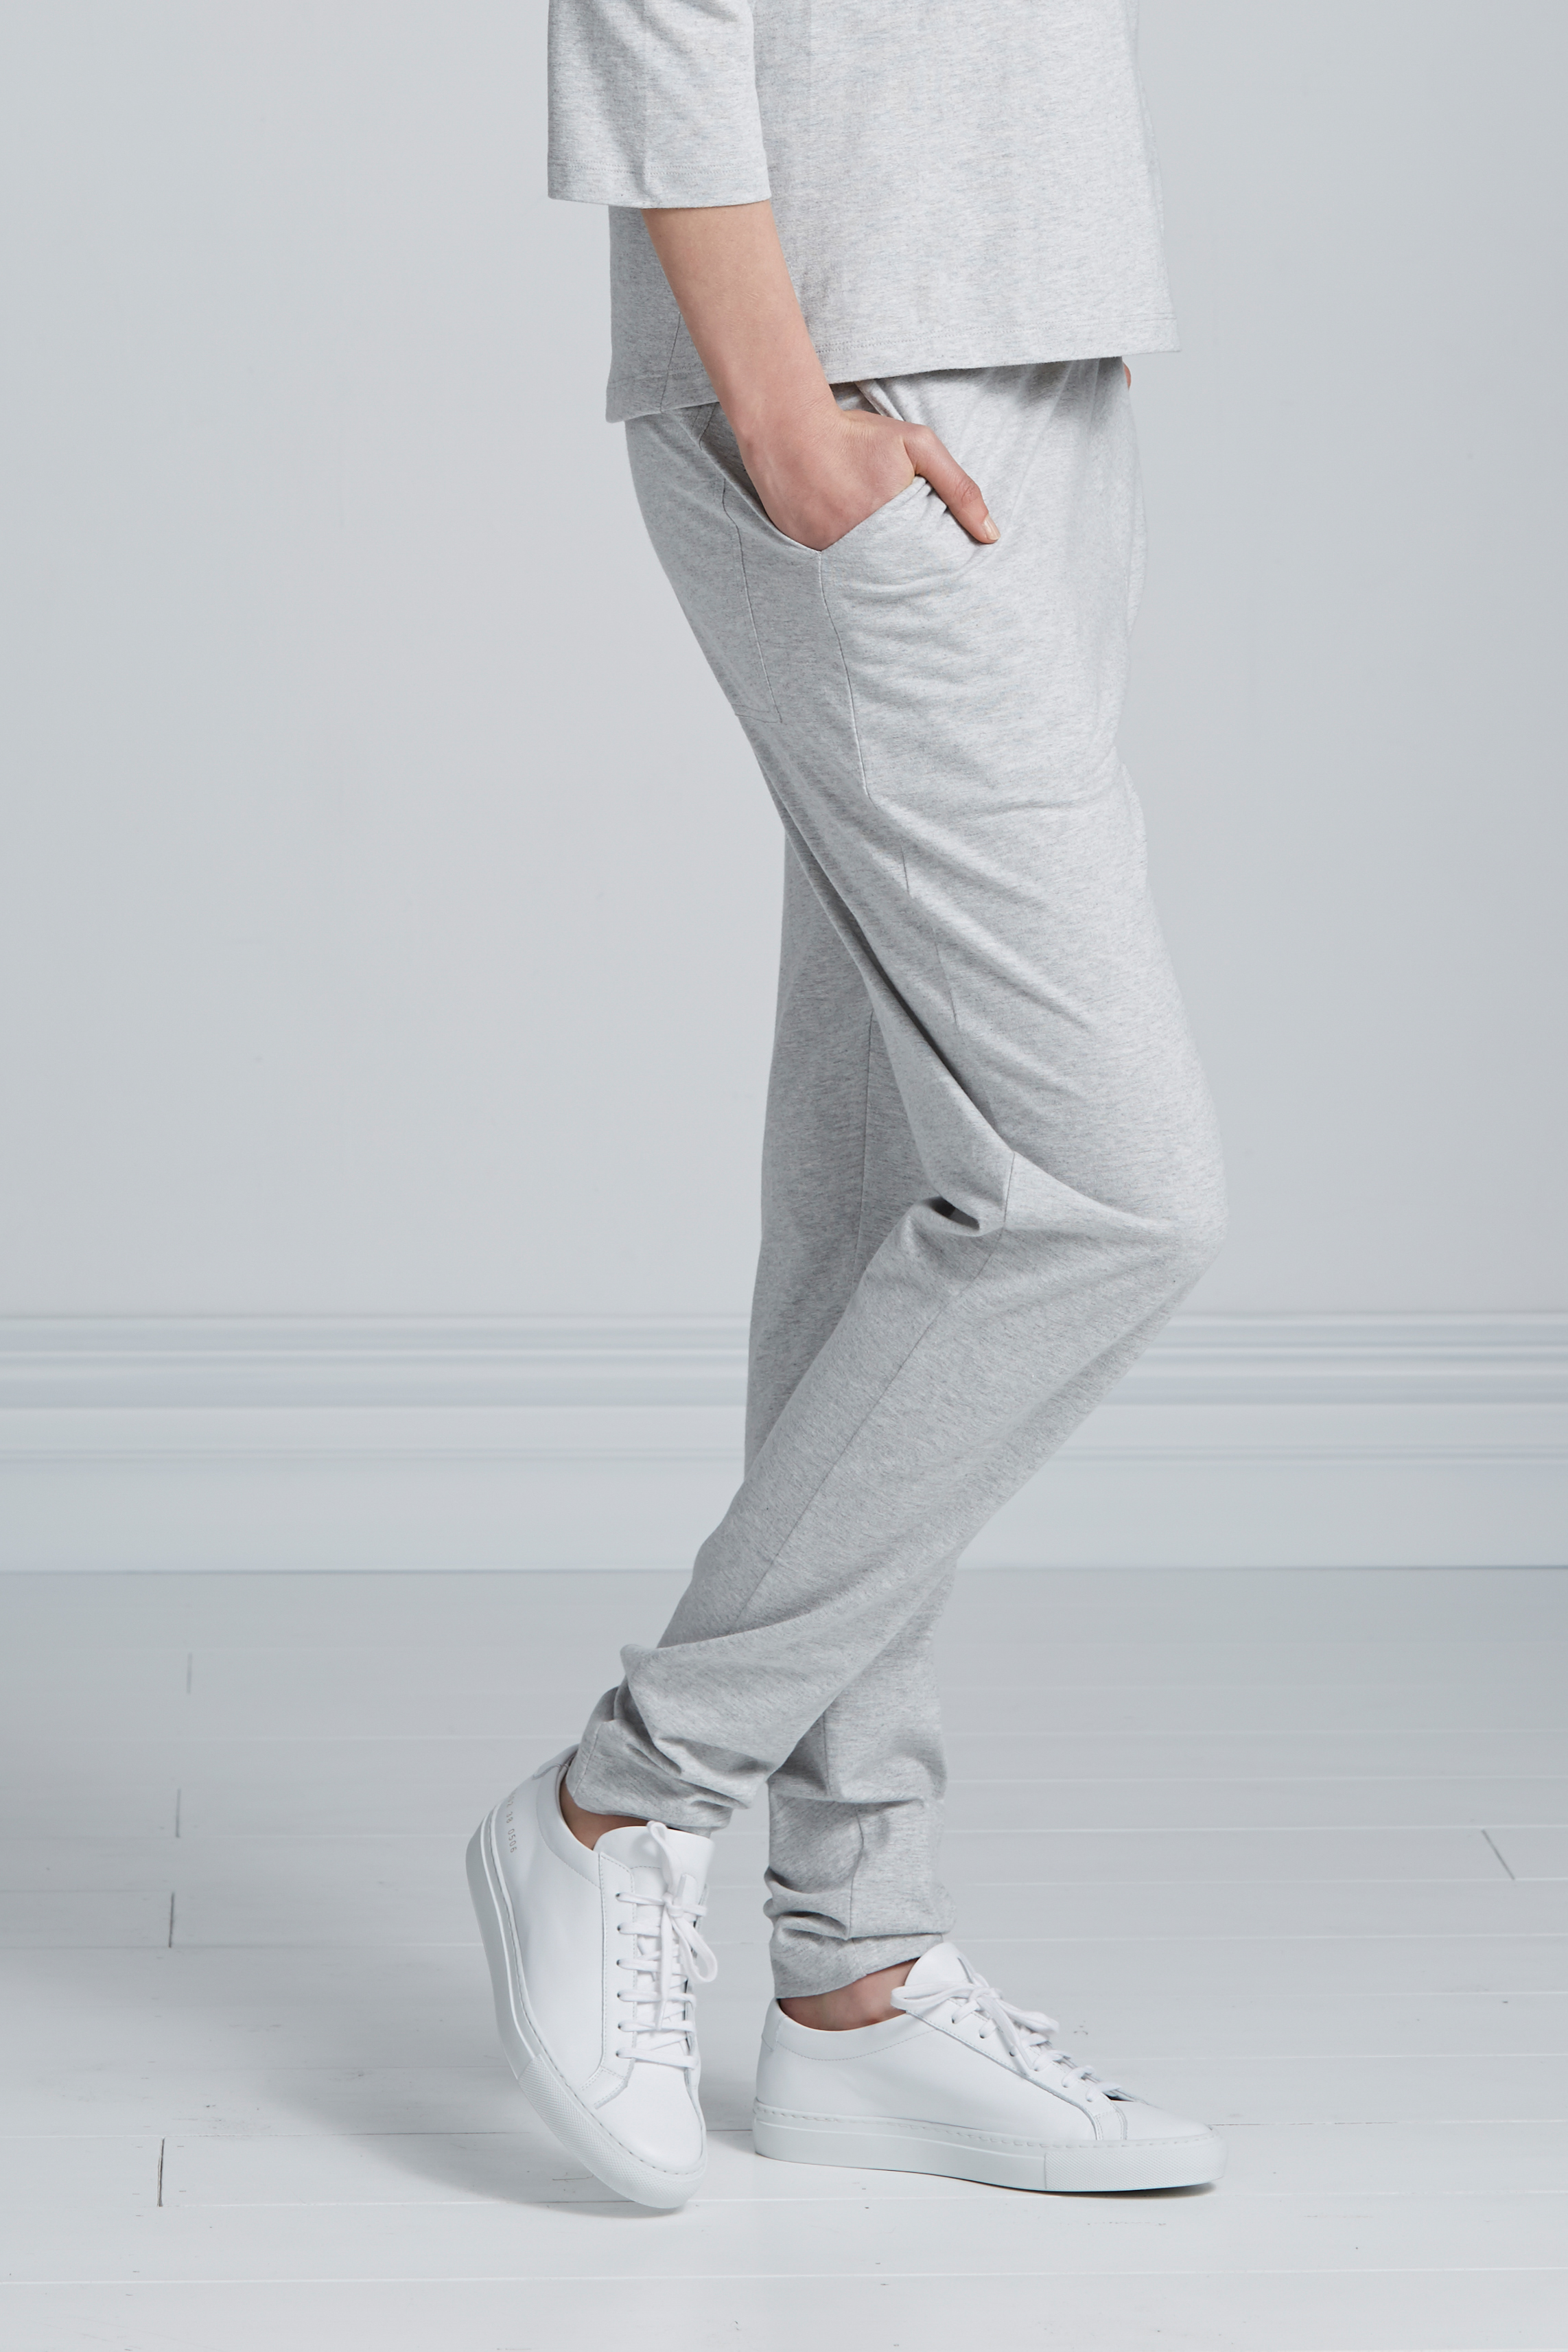 Kowtow  Building Block Pants in Grey Marle  NZD $135